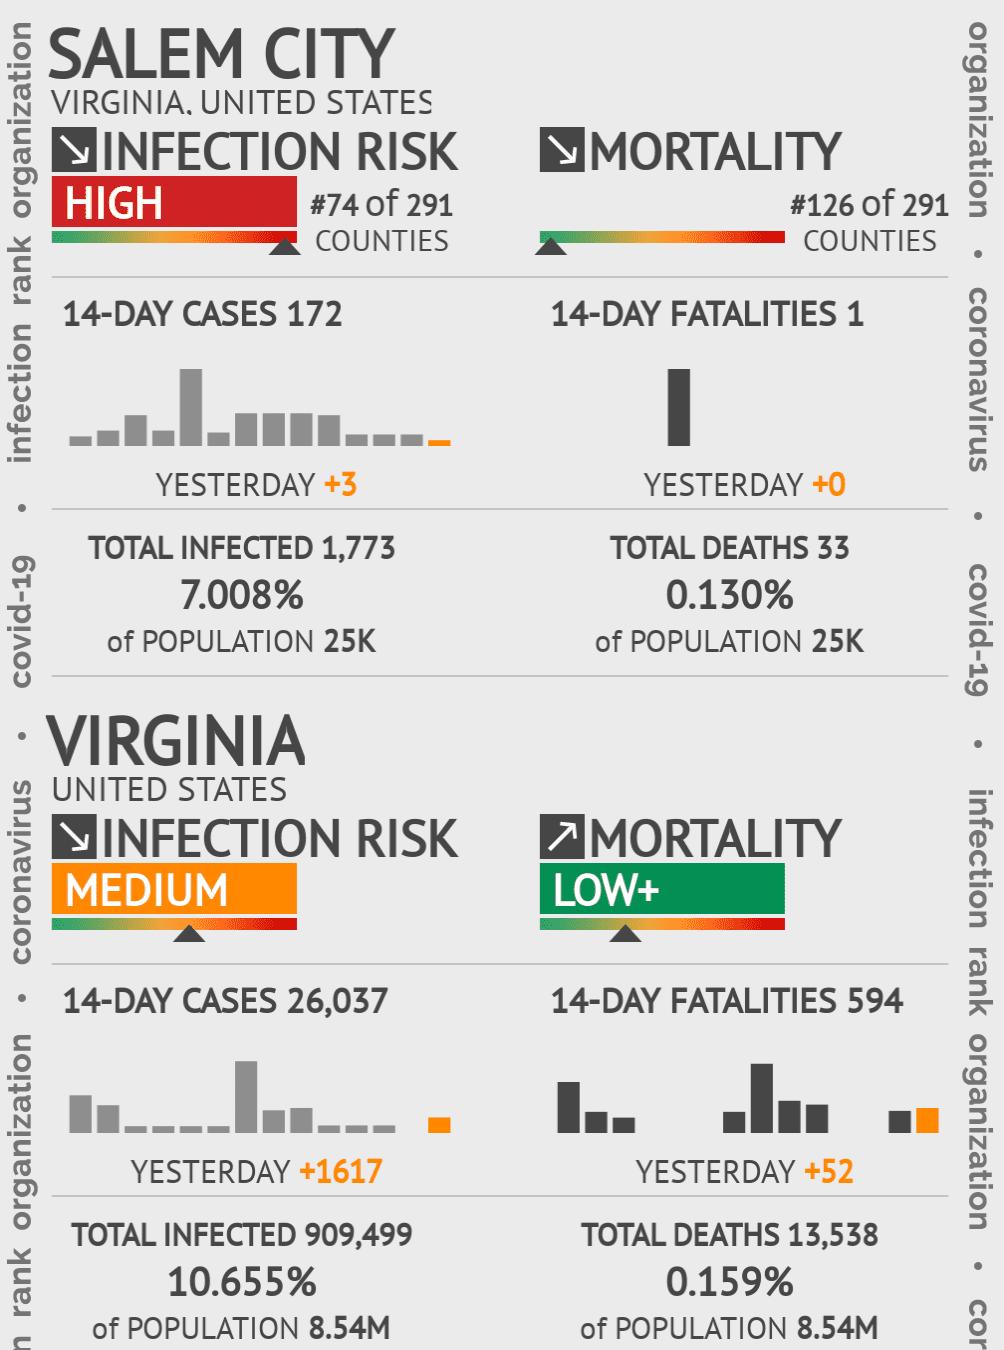 Salem City Coronavirus Covid-19 Risk of Infection on February 04, 2021